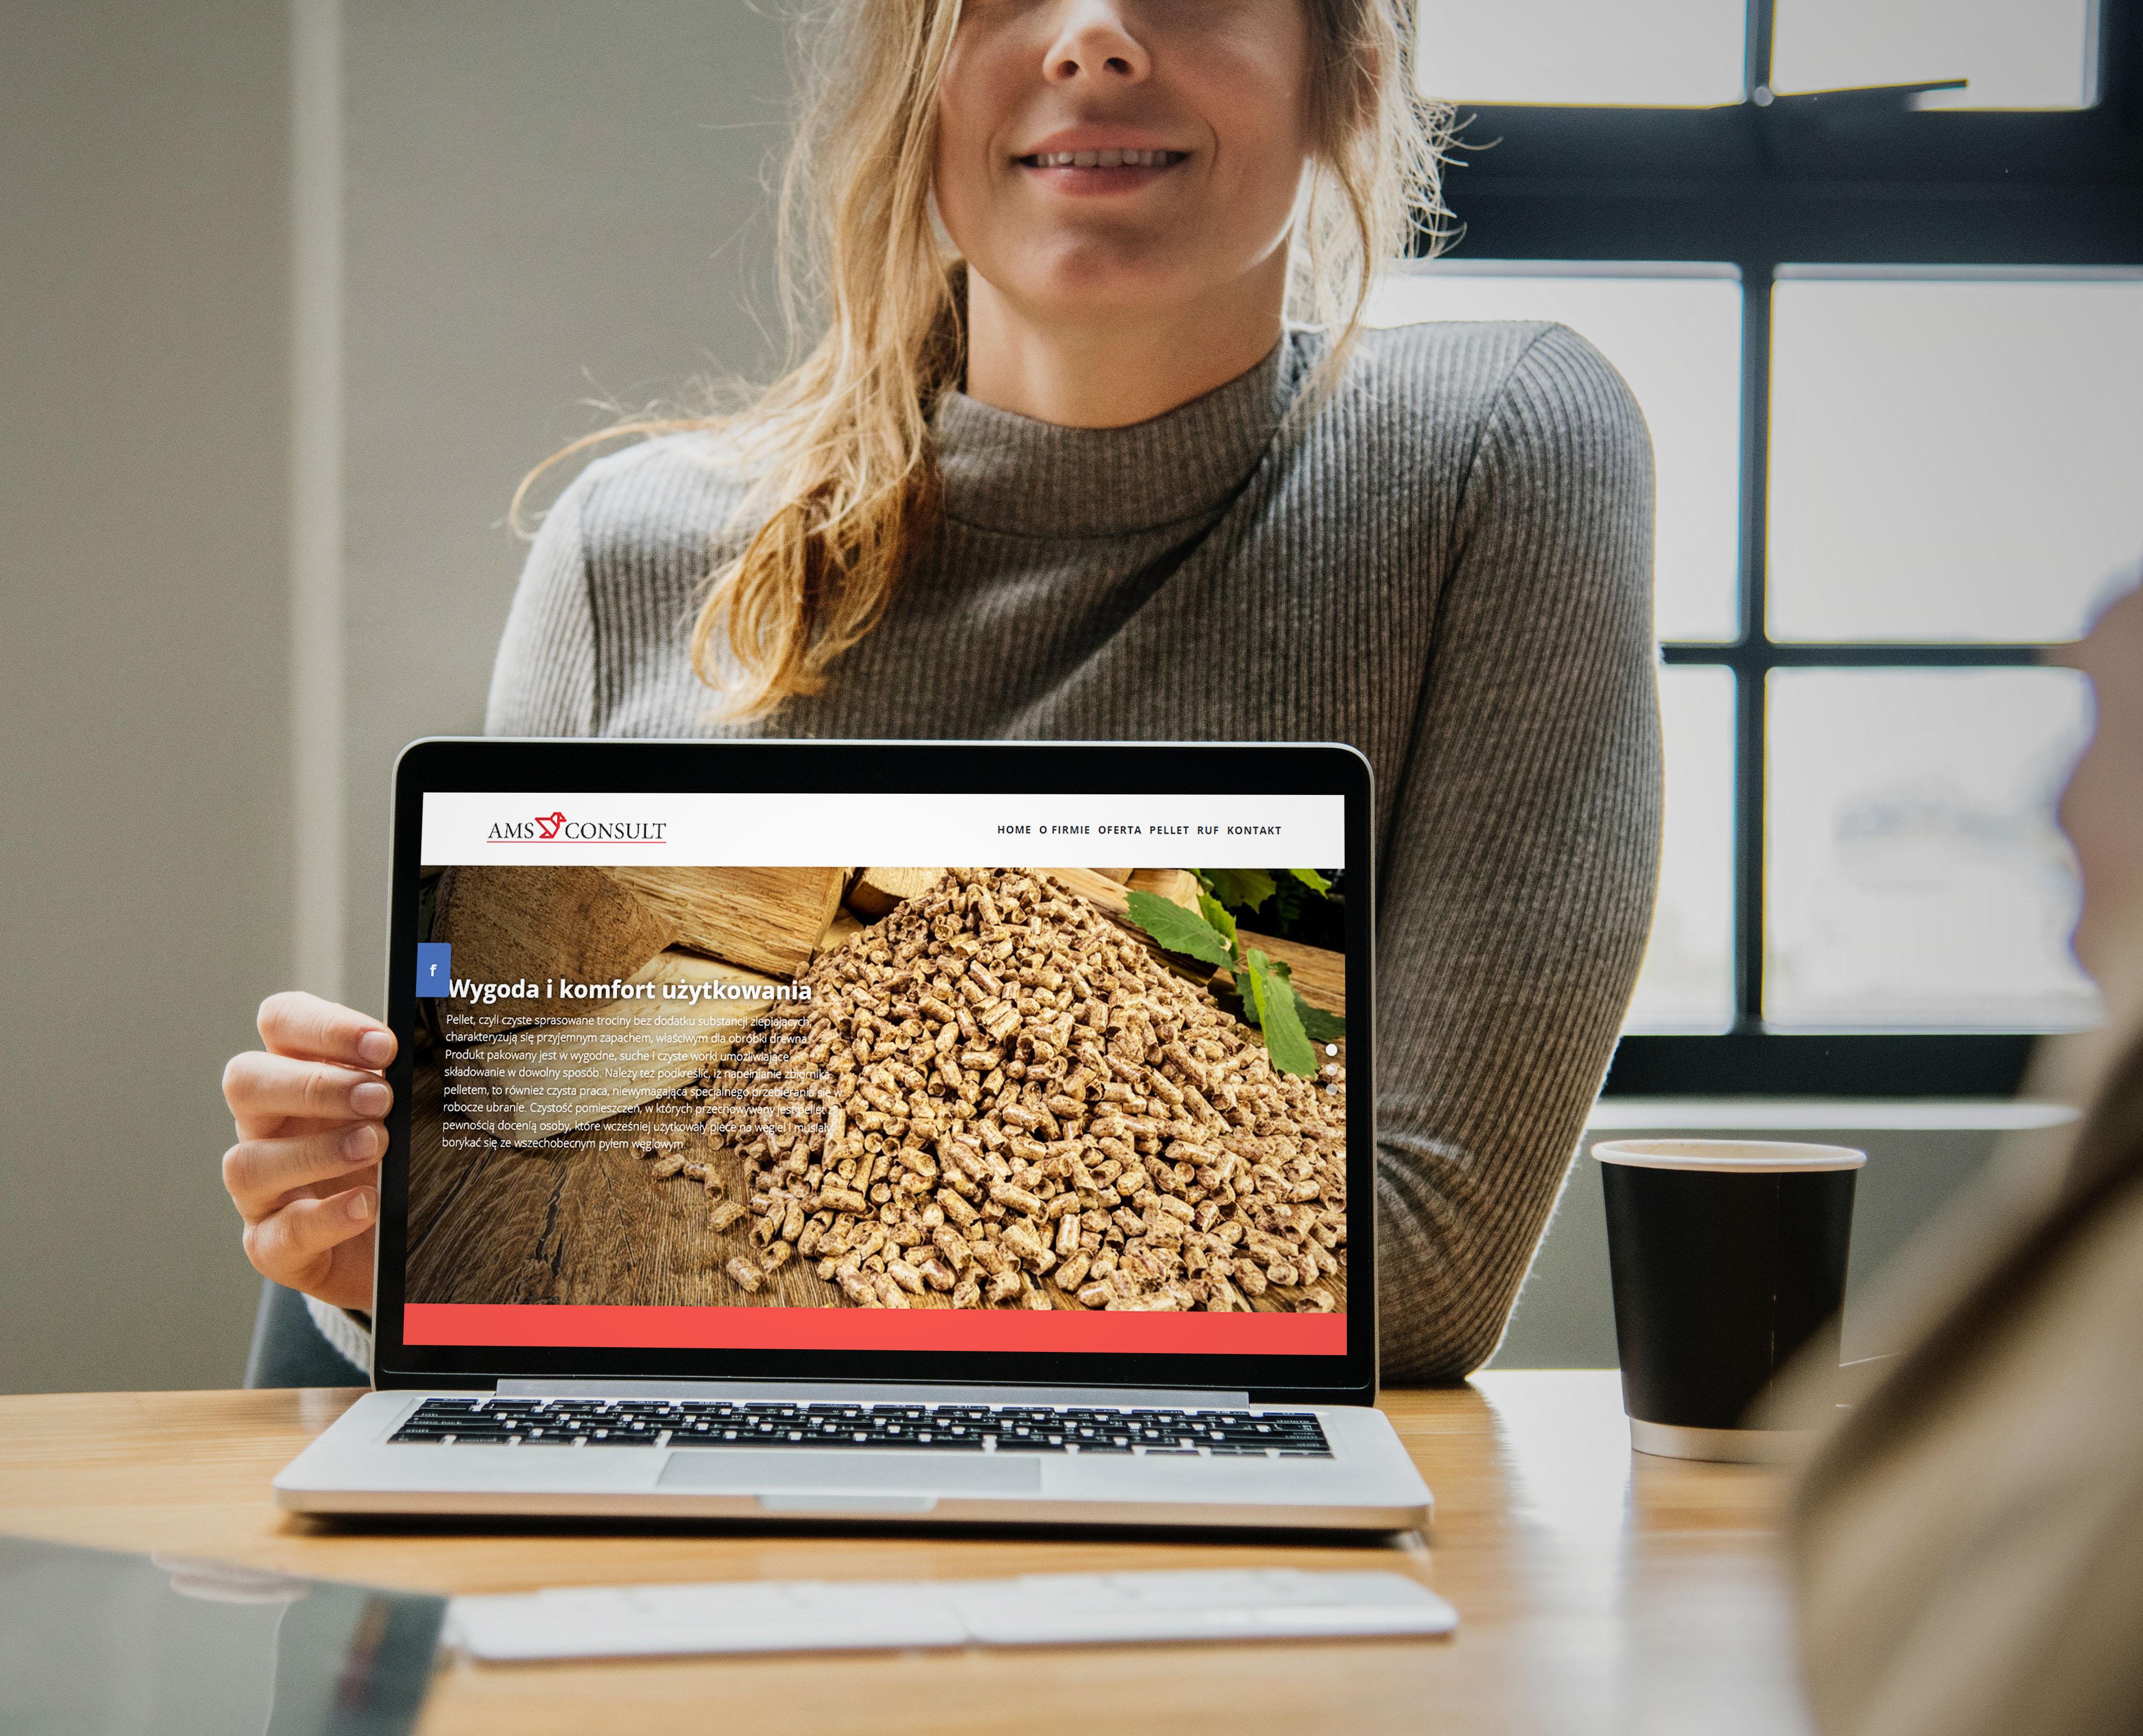 Strona internetowa pellethurt.pl dla AMS Consult